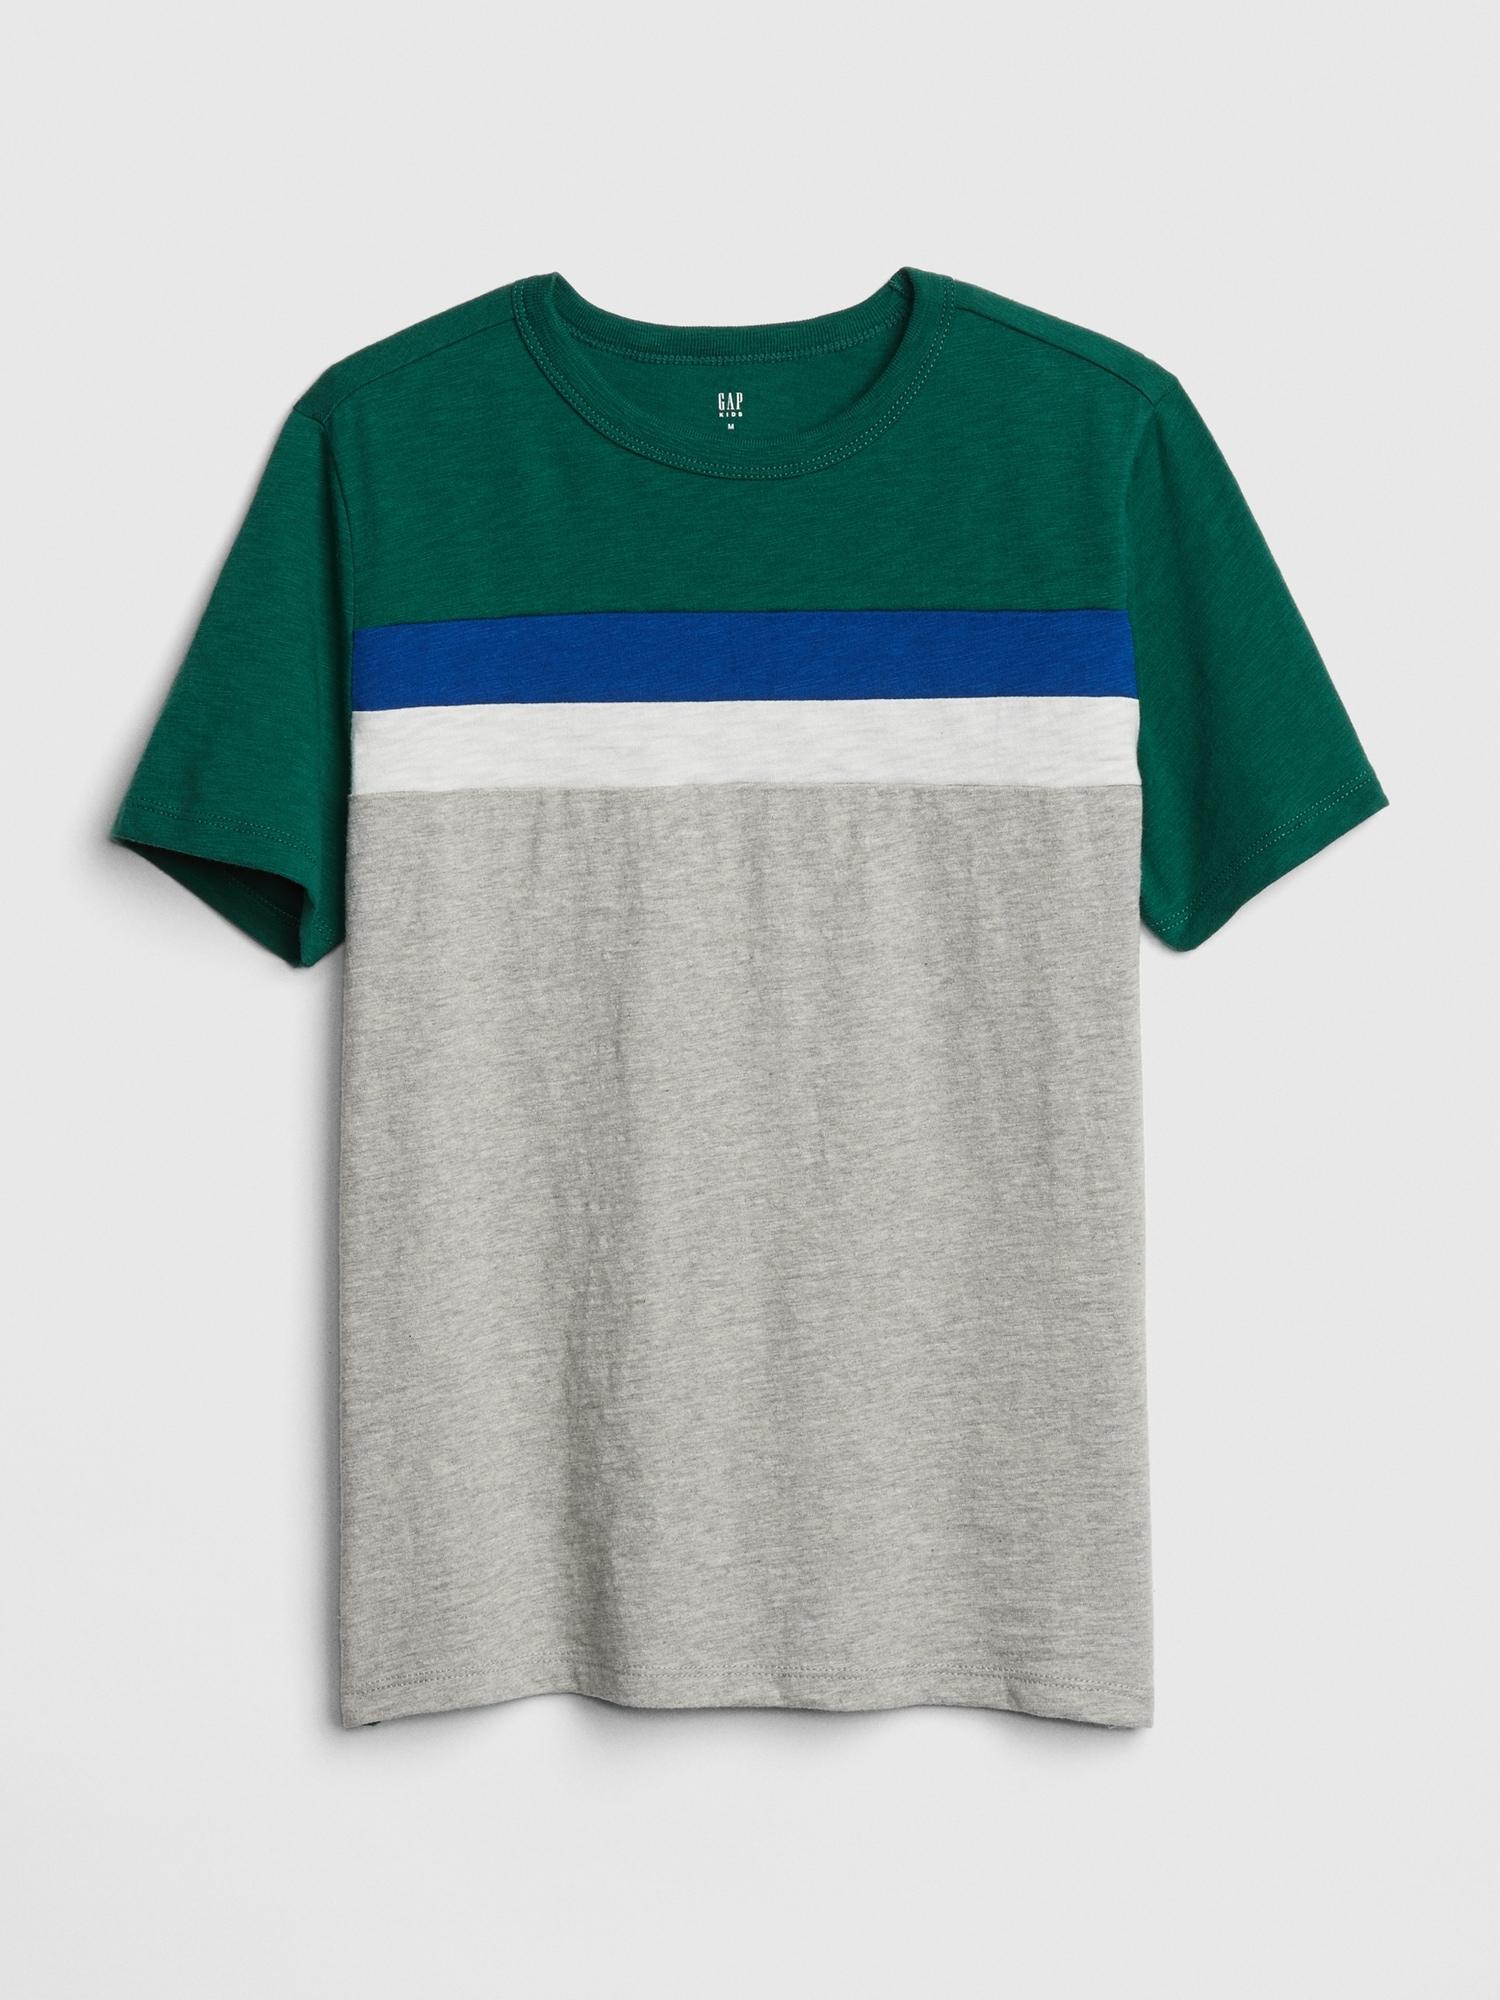 aa67c51433fd Kids Colorblock Short Sleeve T-Shirt | Gap